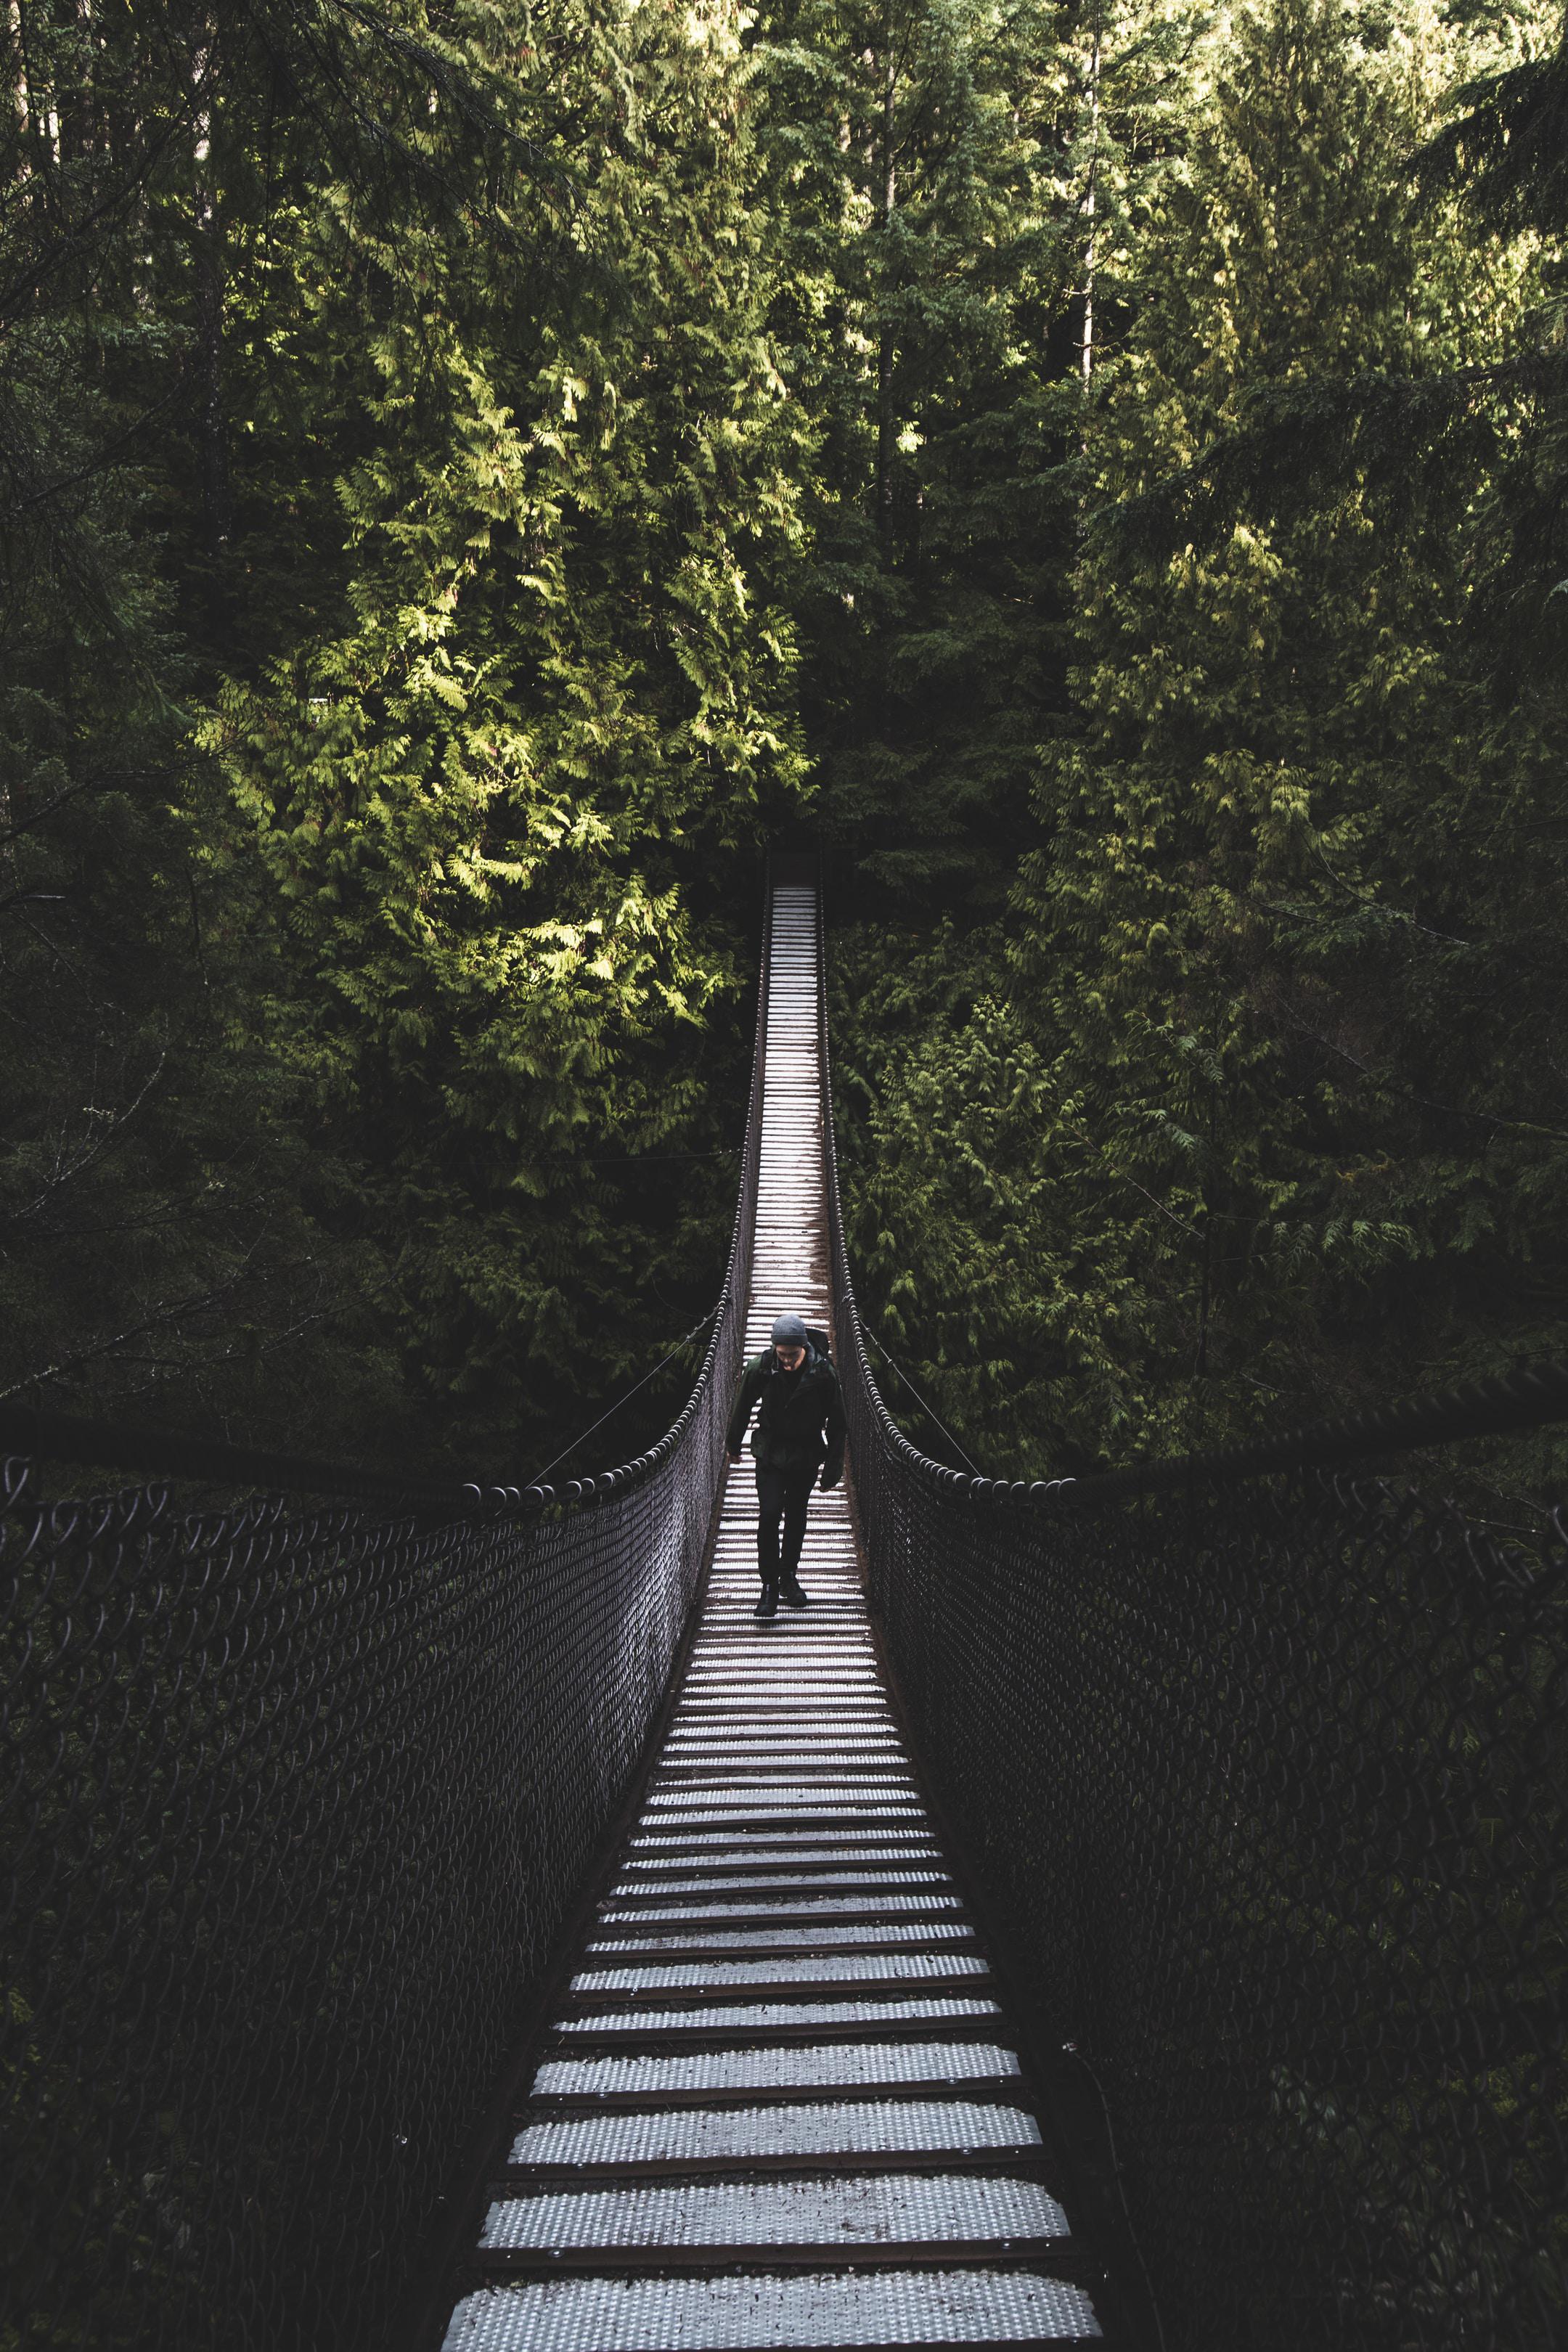 man walking on wooden bridge in the forest